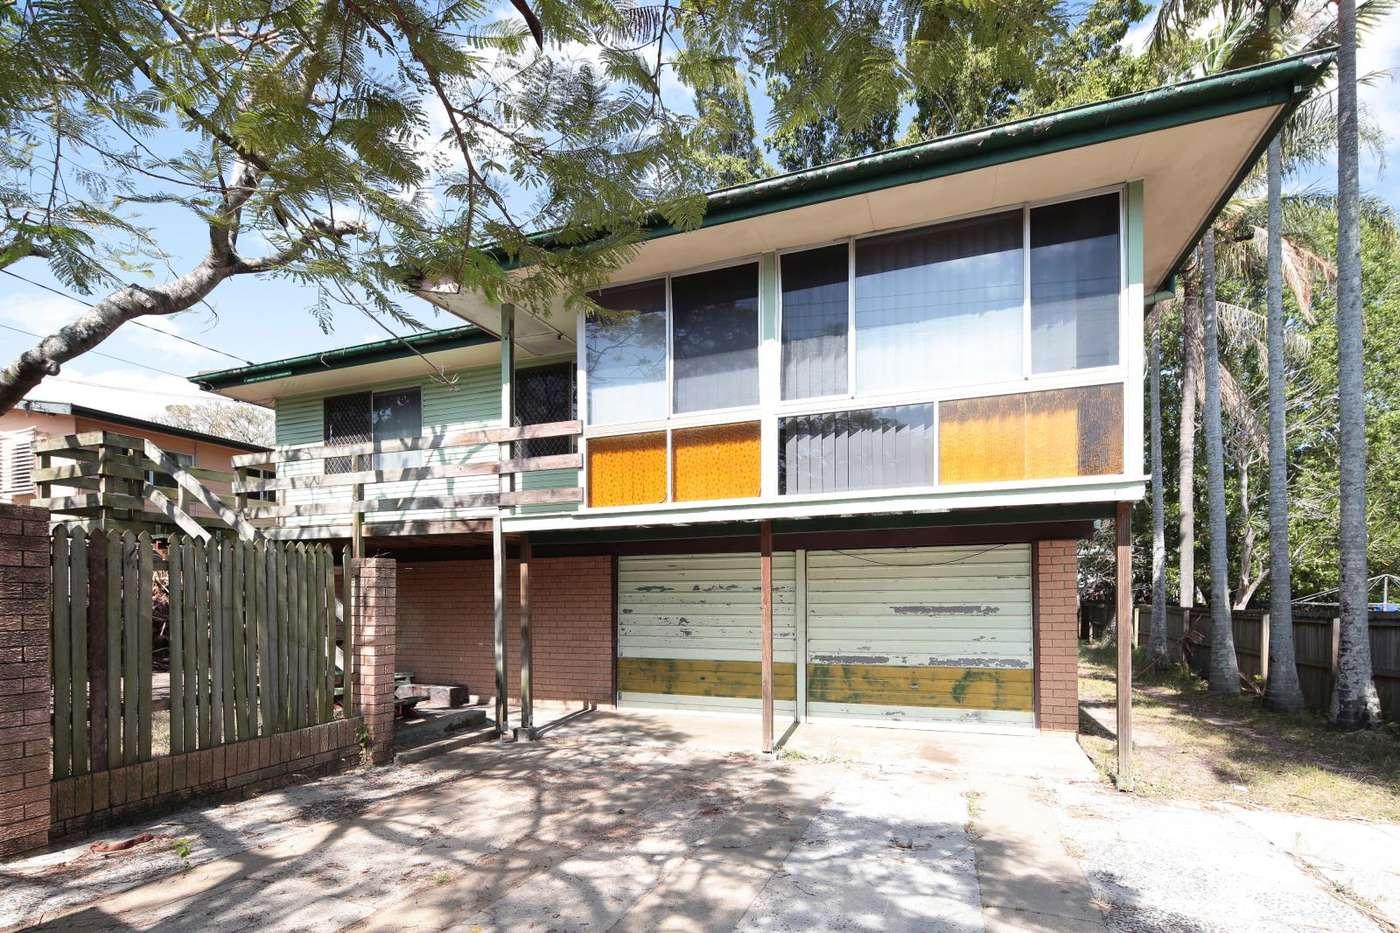 Main view of Homely house listing, 336 Kingston Road, Slacks Creek, QLD 4127